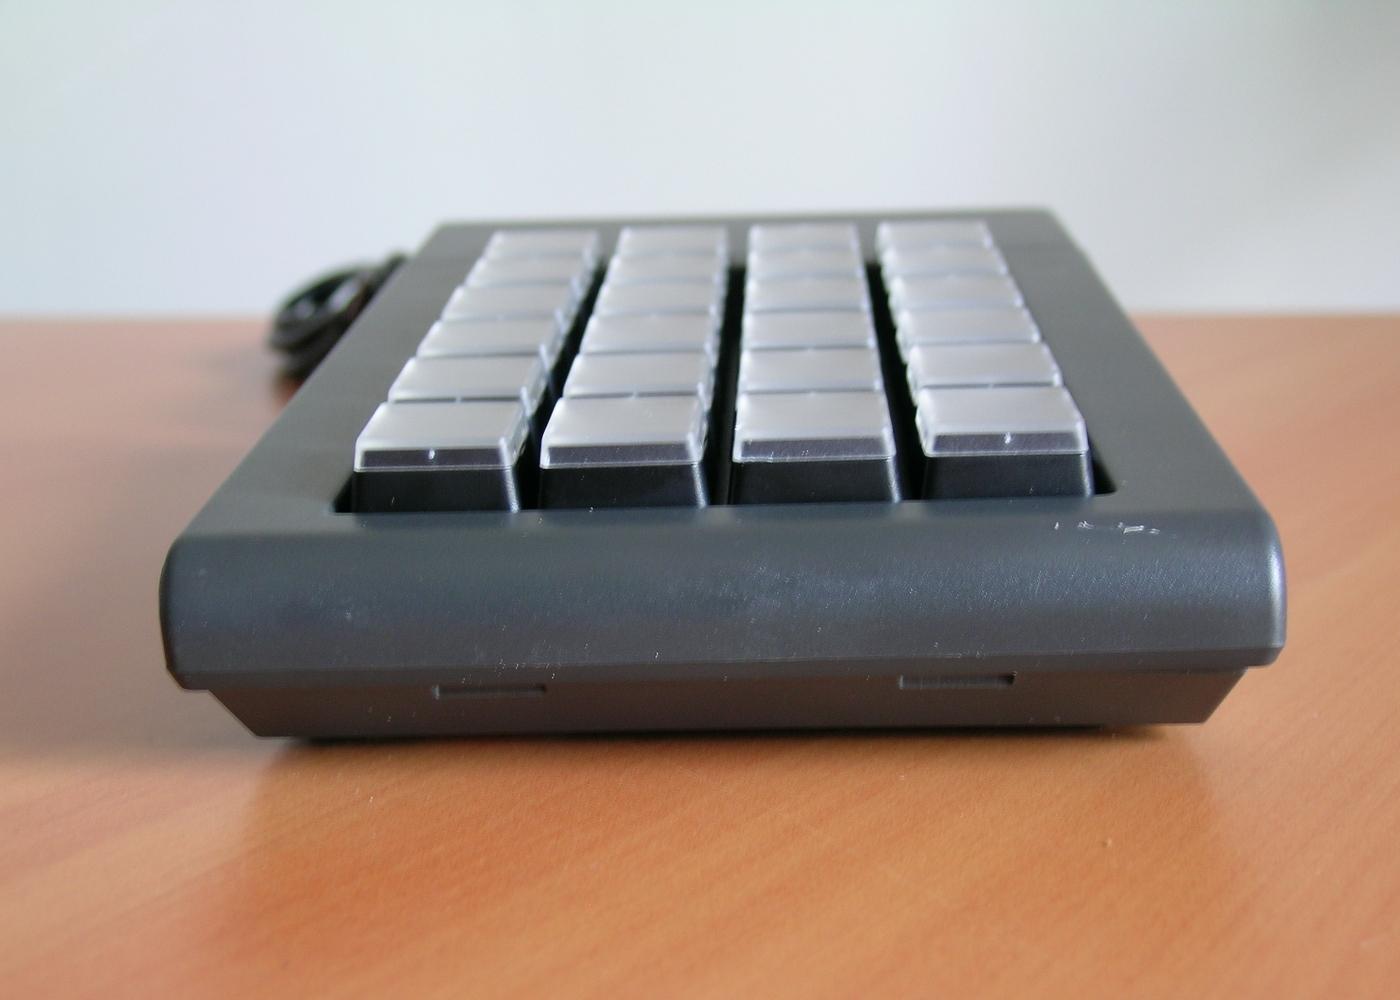 Clavier semi-industriel 24 touches programmable en boitier de table – Vue avant